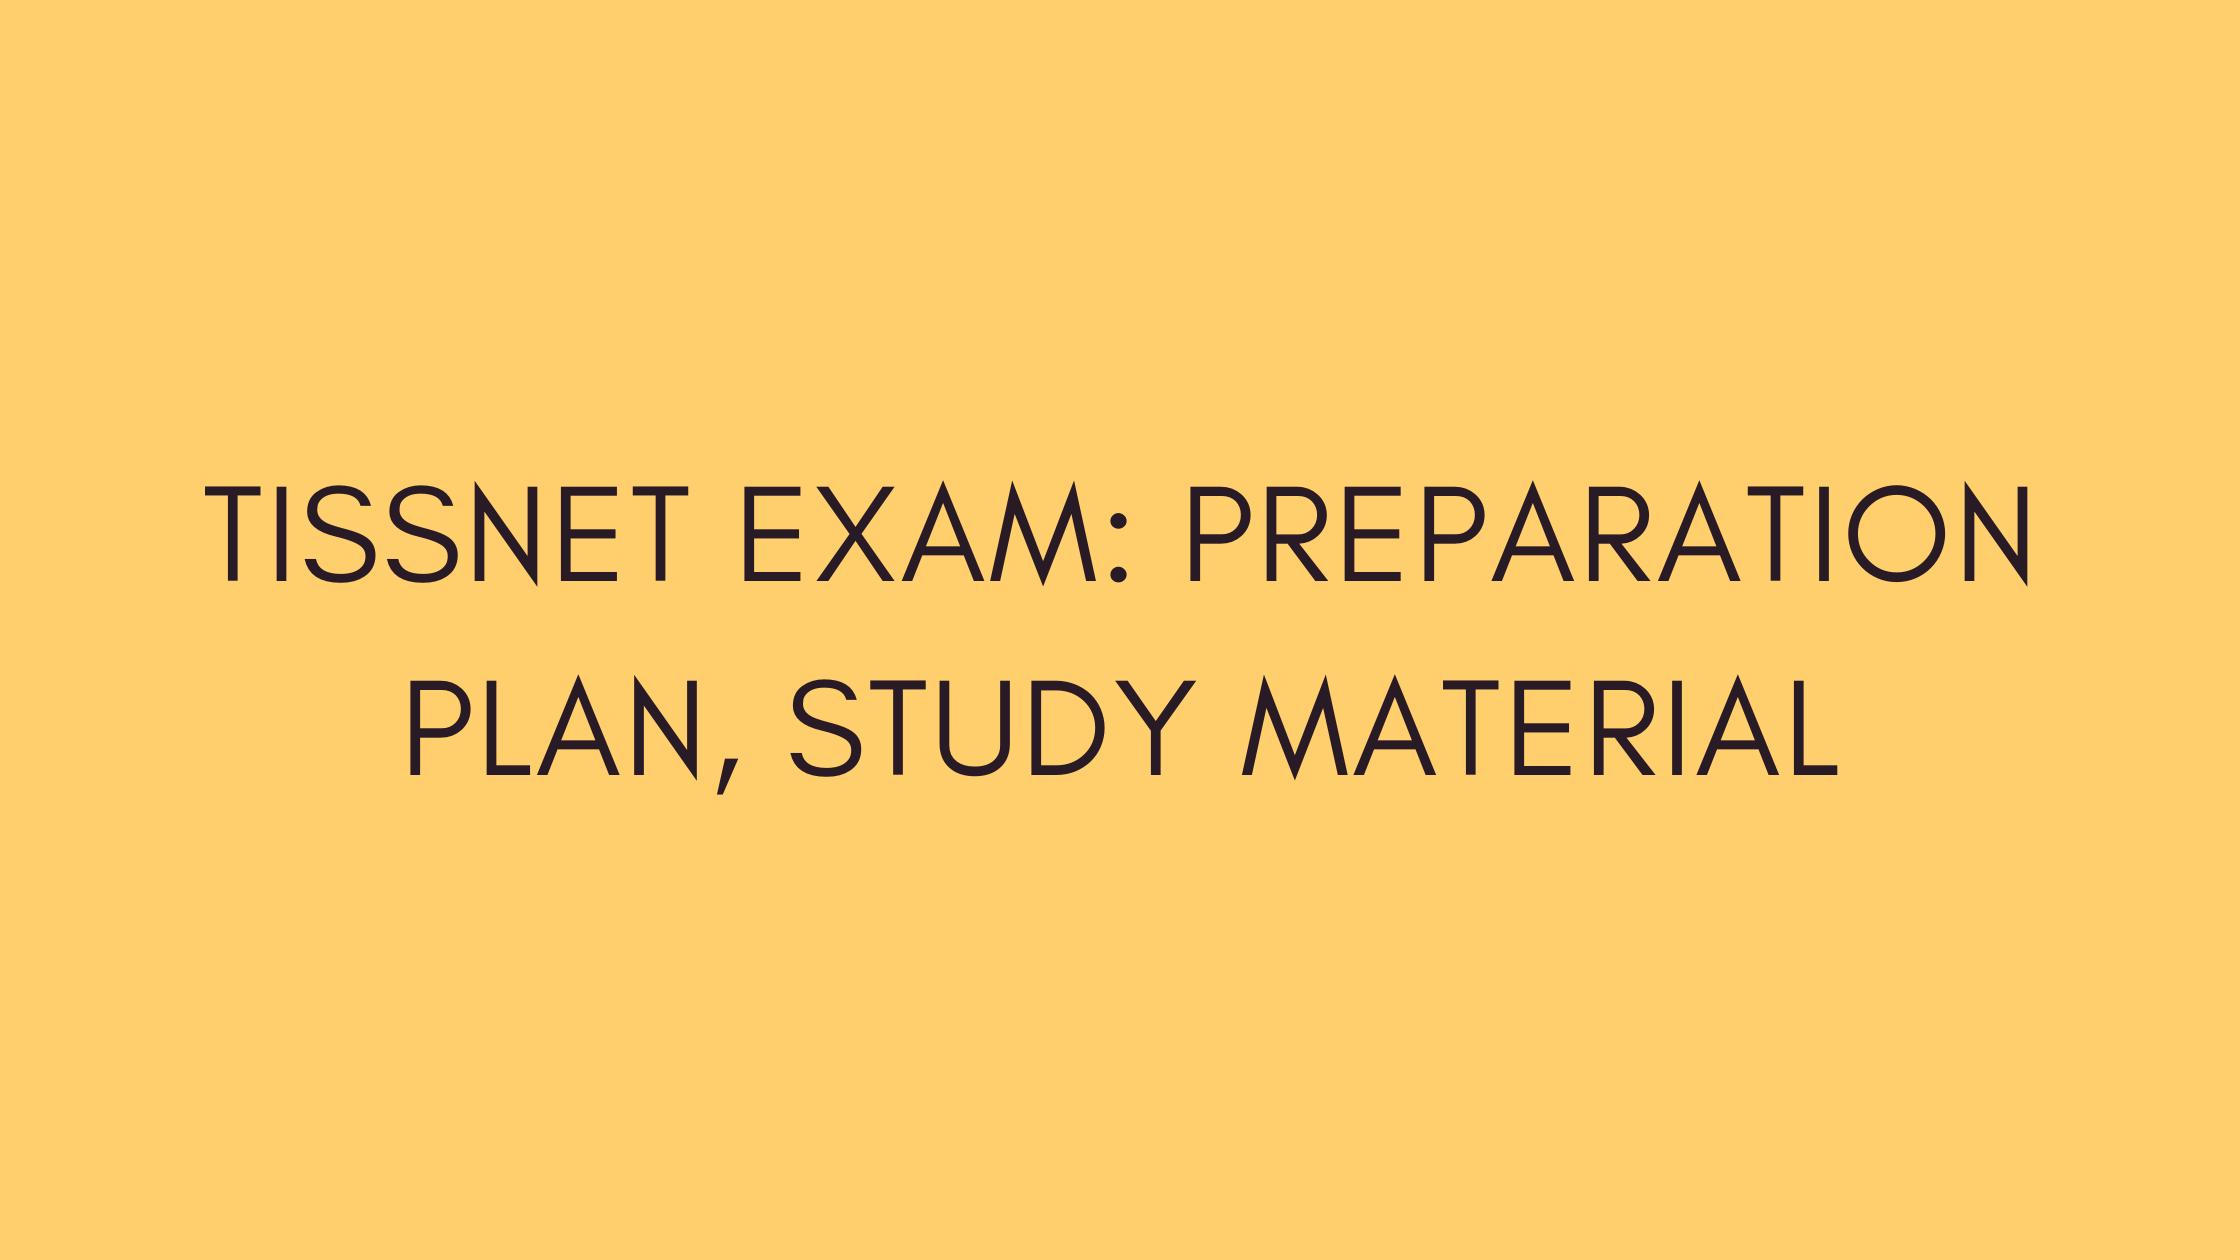 tissnet exam, TISSNET Exam 2022, Preparation Plan, Strategy, Study Material